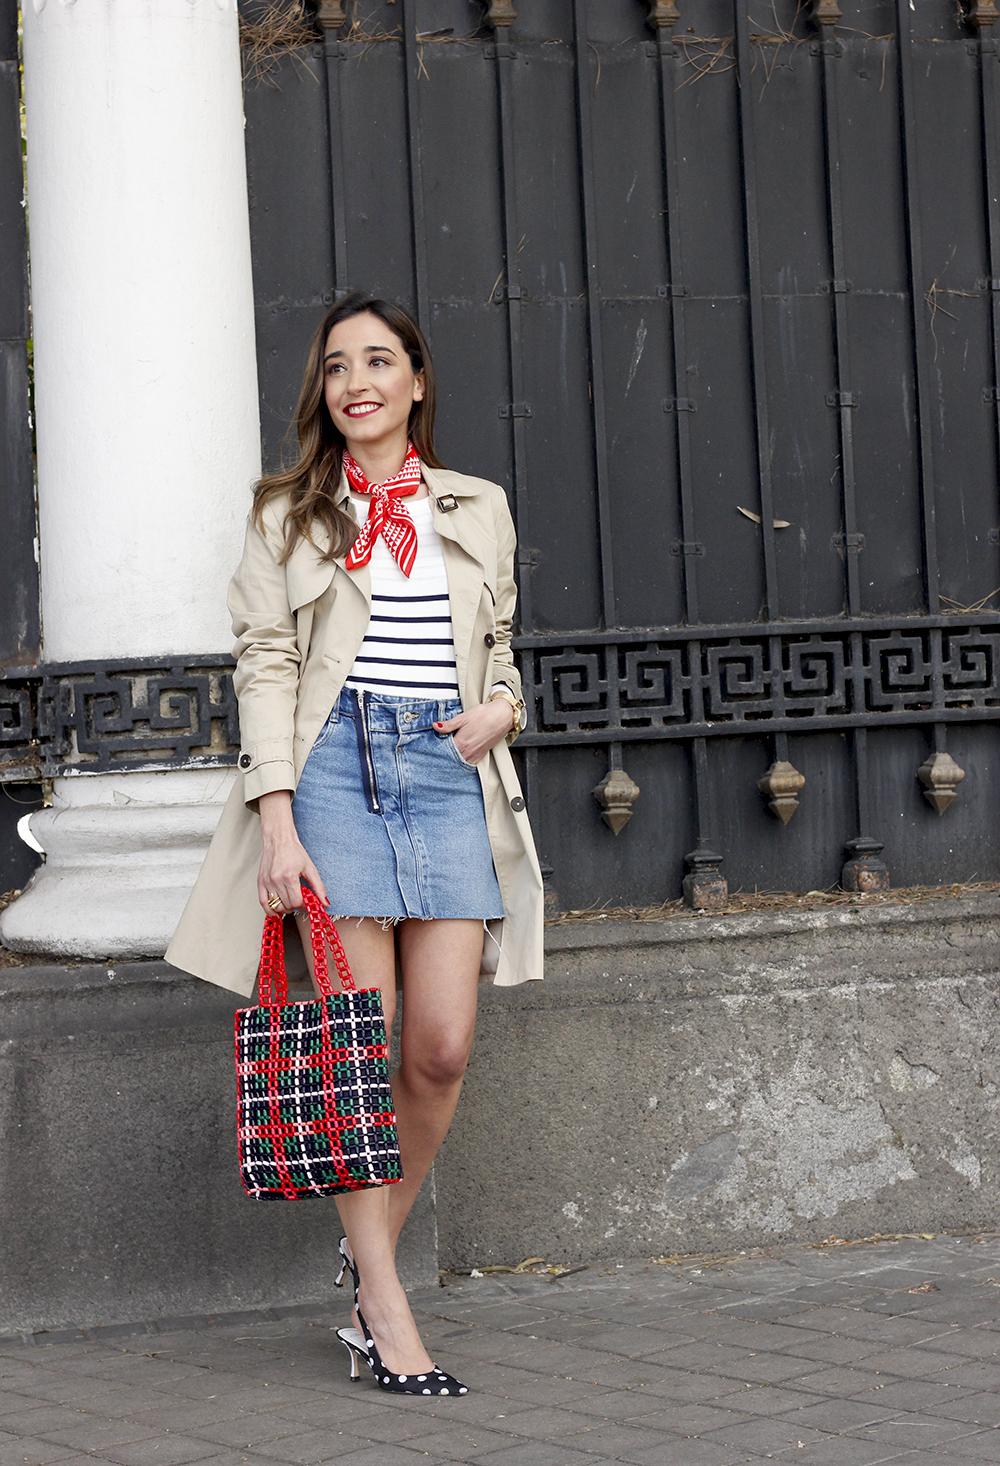 trench outfit denim skirt kitten heels striped sweater spring 04